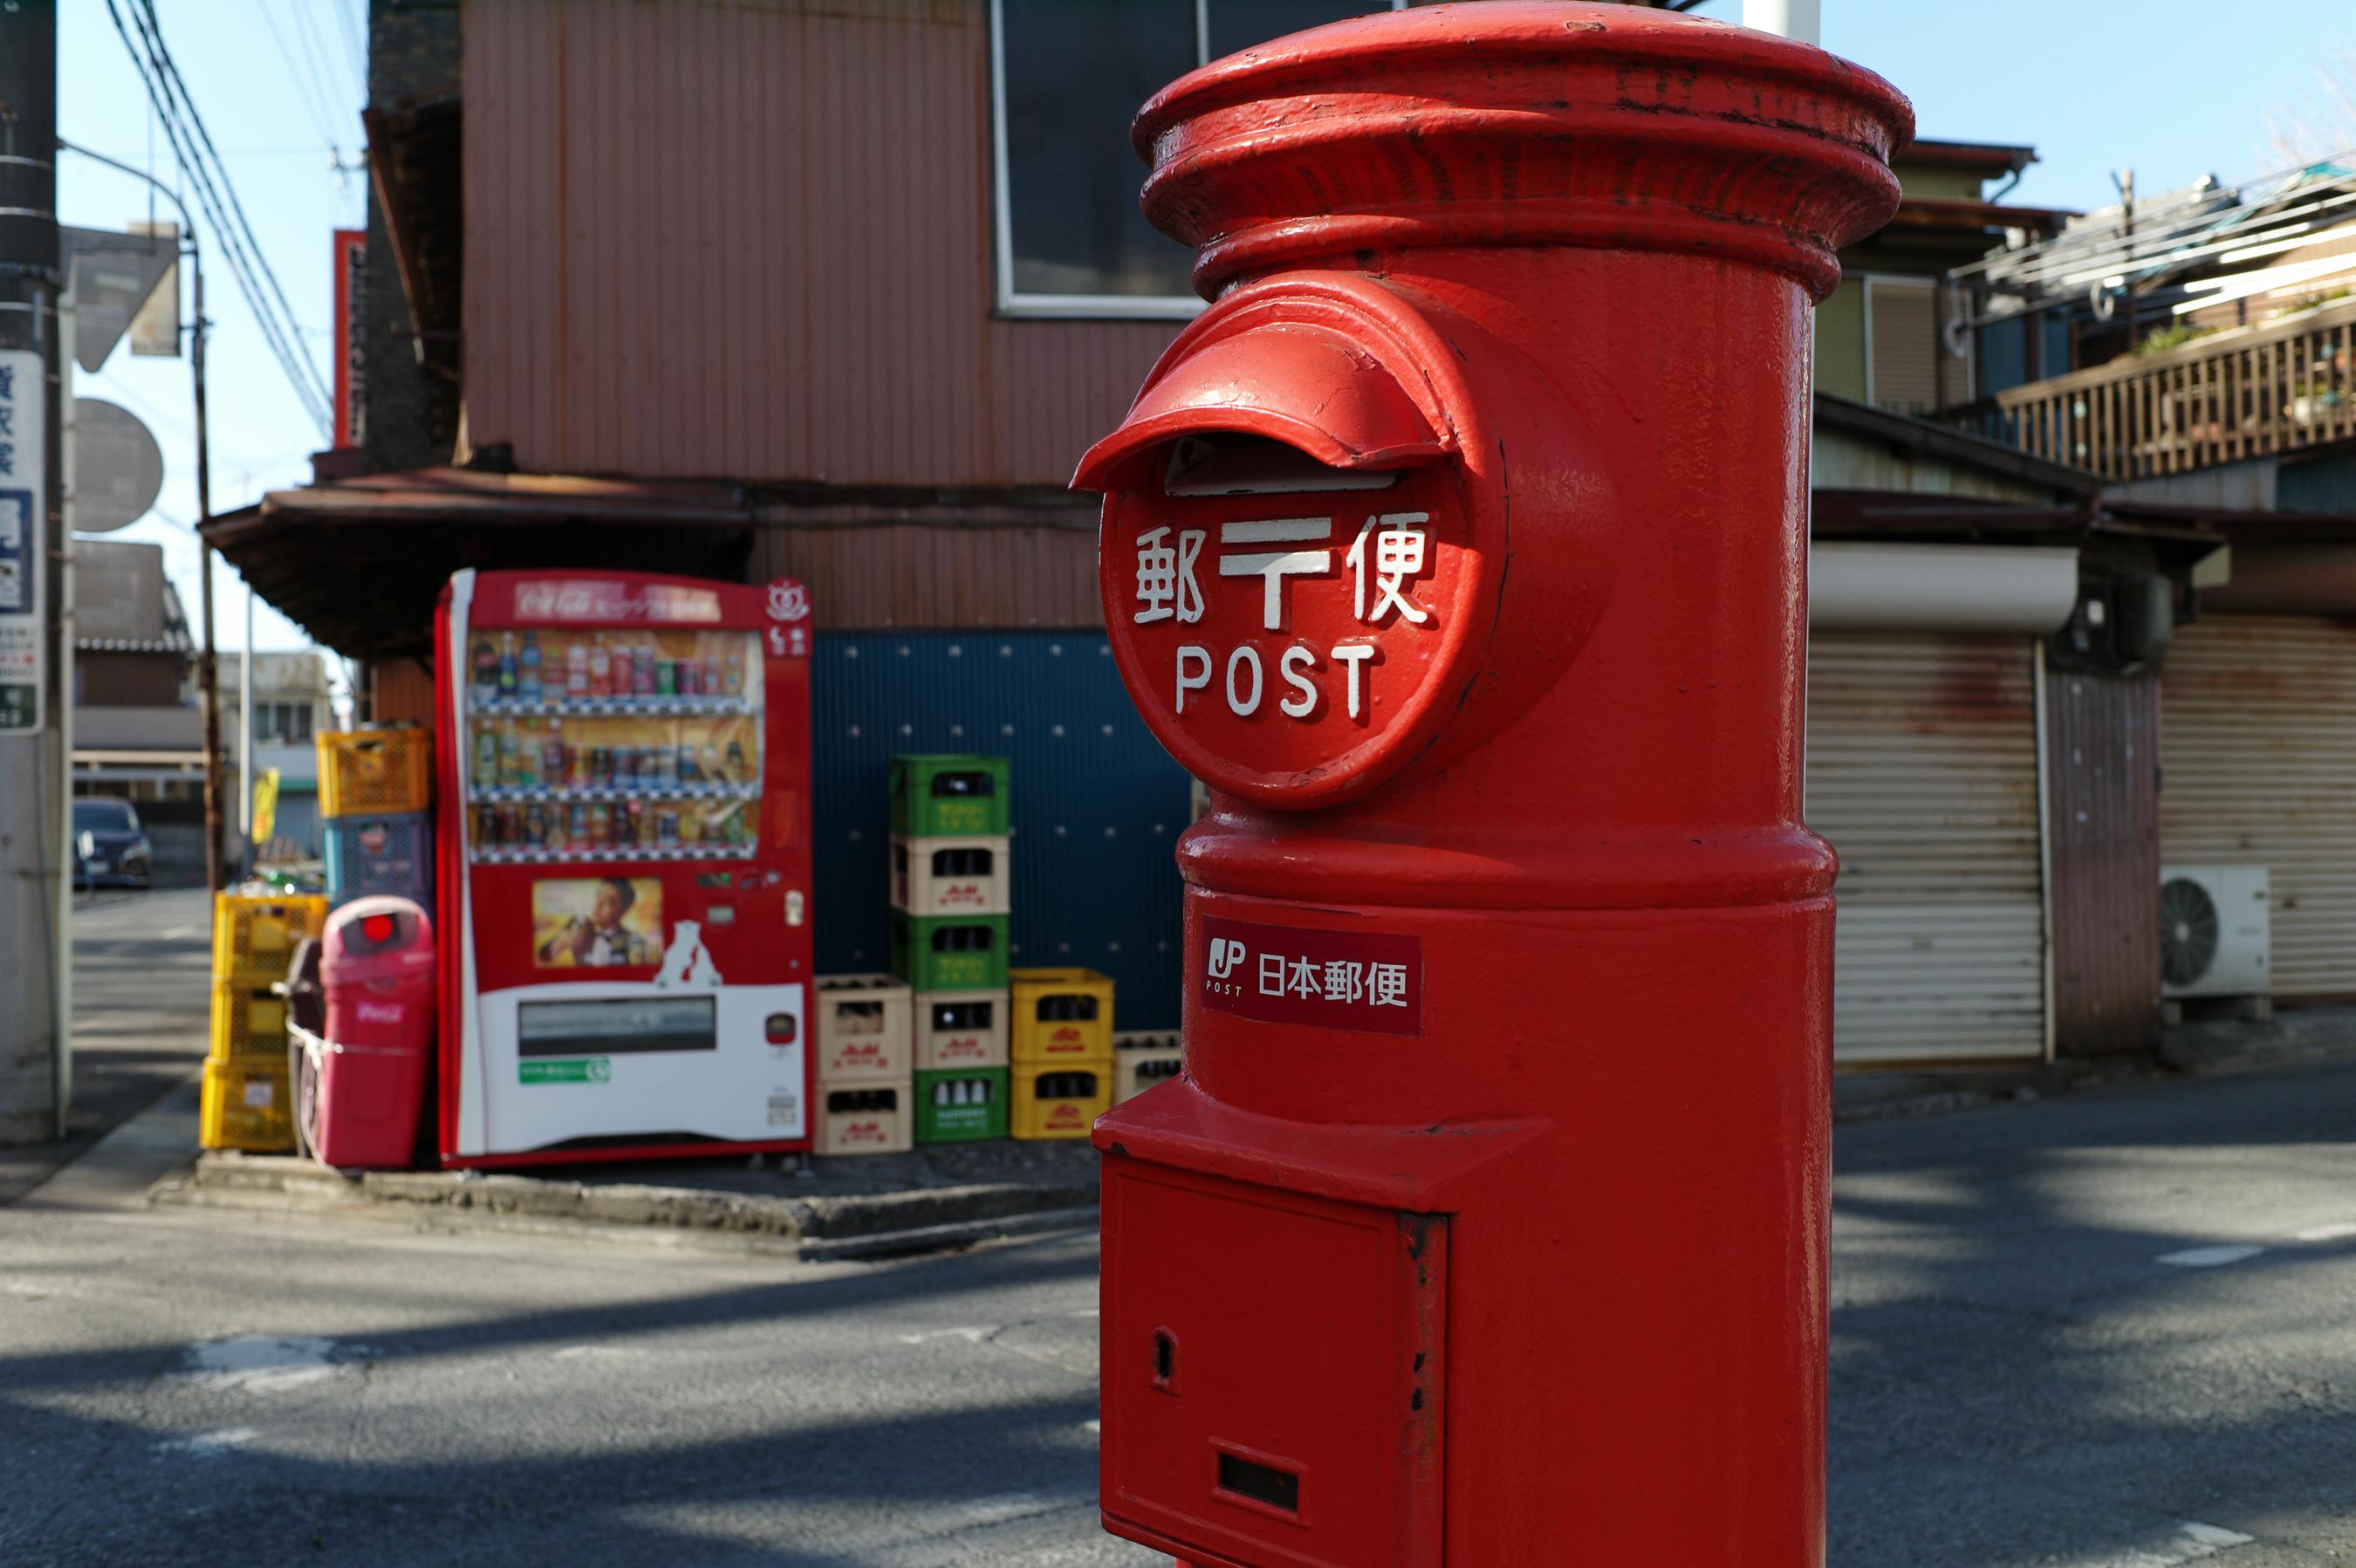 f:id:aoyama-takuro:20180212005319j:plain